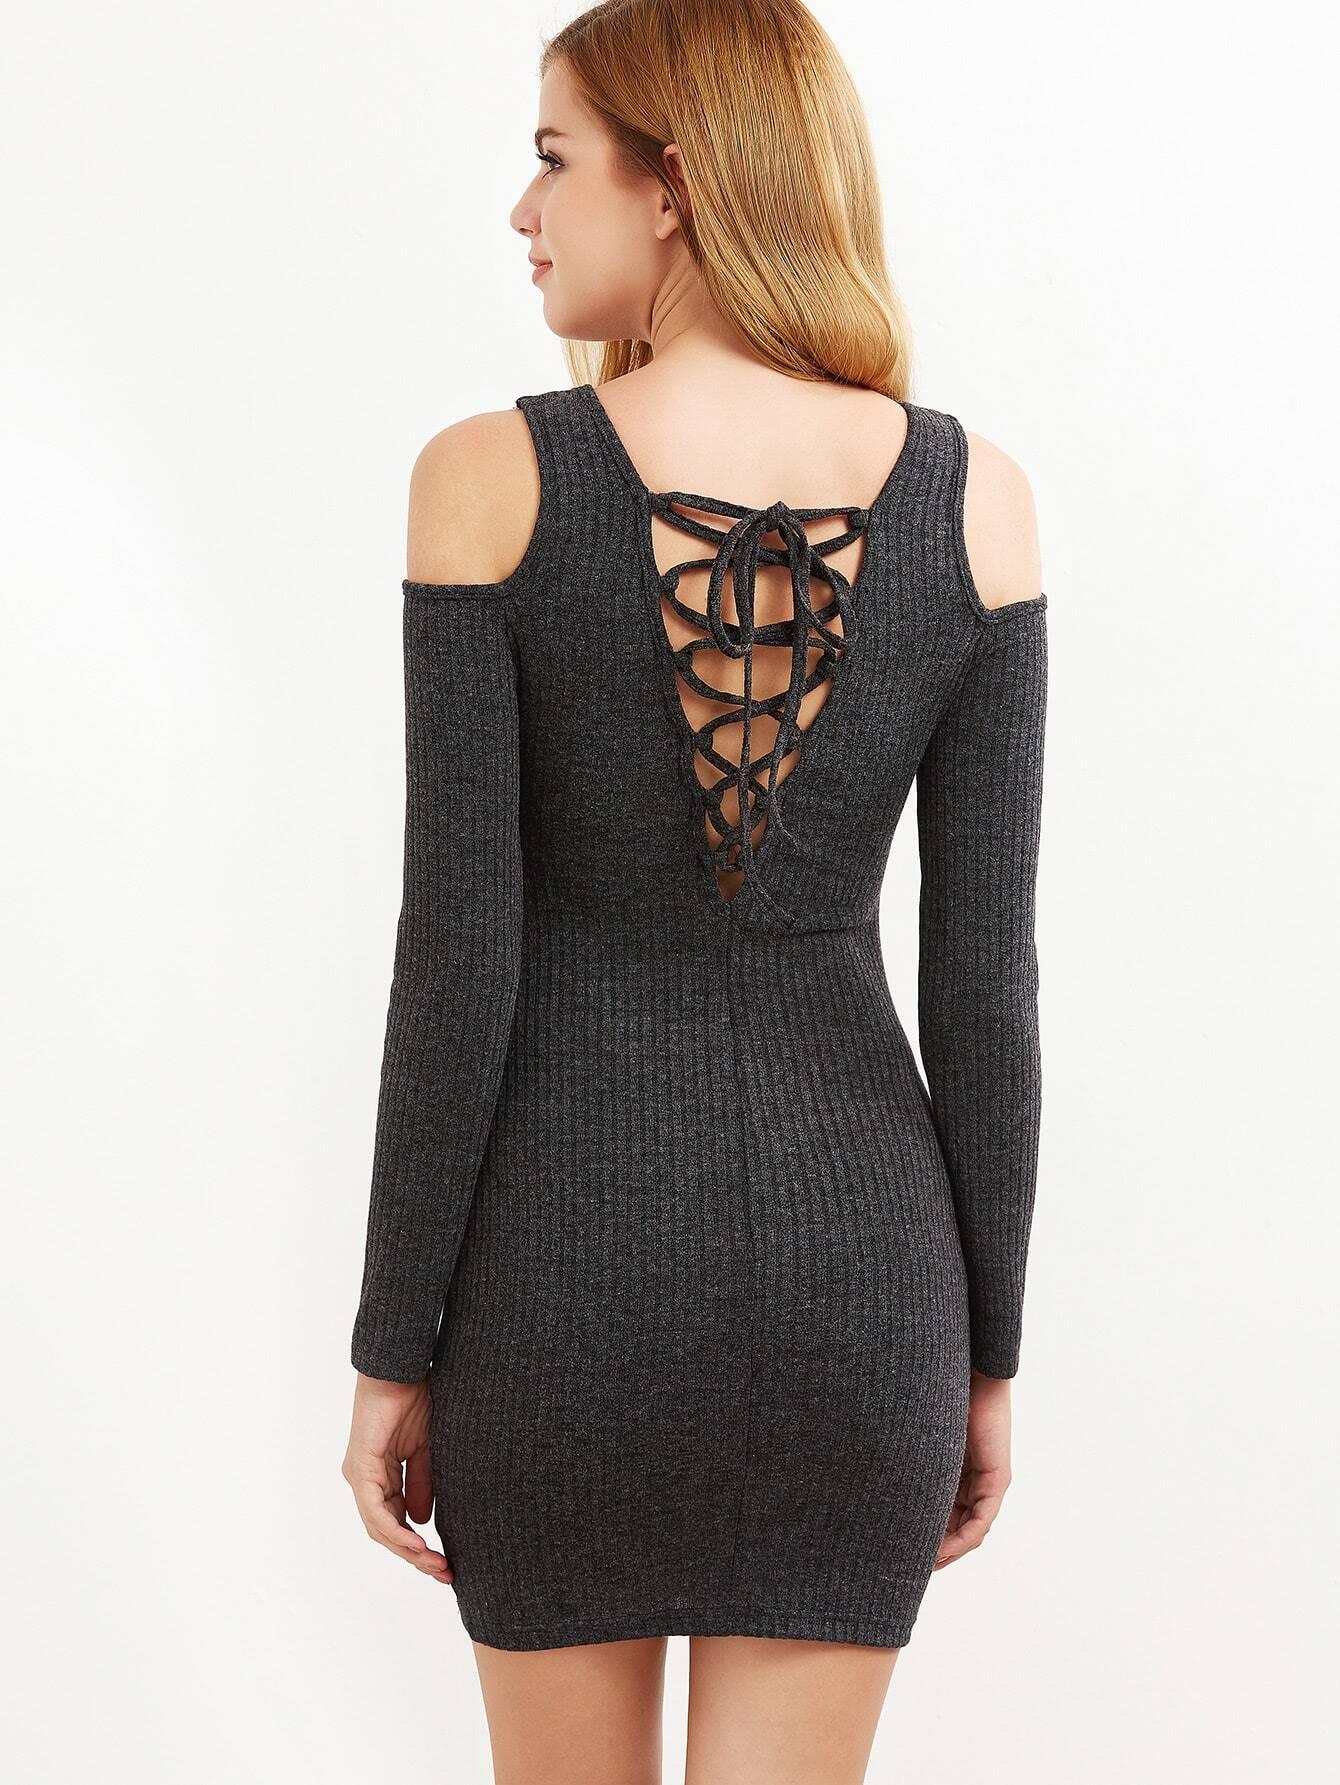 Open Shoulder Lace Up Back Ribbed Knit Dress dress161108704